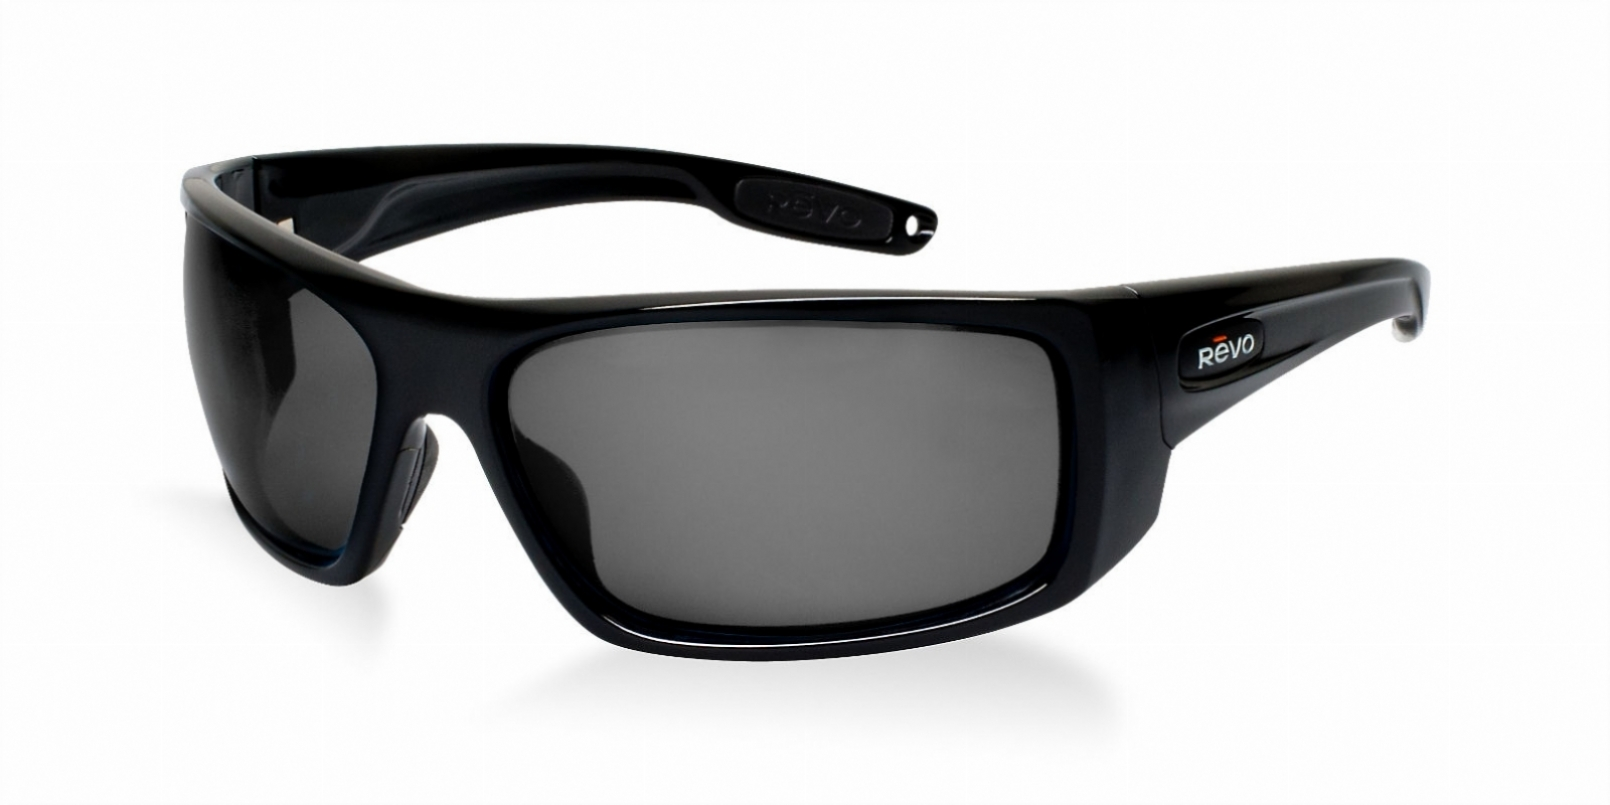 Revo Sunglasses Repair  revo headway 4062 sunglasses